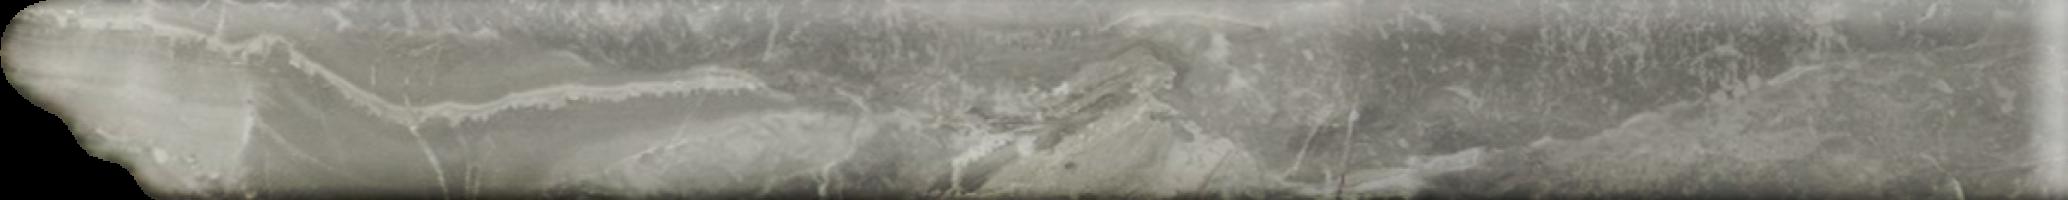 Боковина ступени левая Ape Ceramica Orobico Izq Grigio 3.2x33